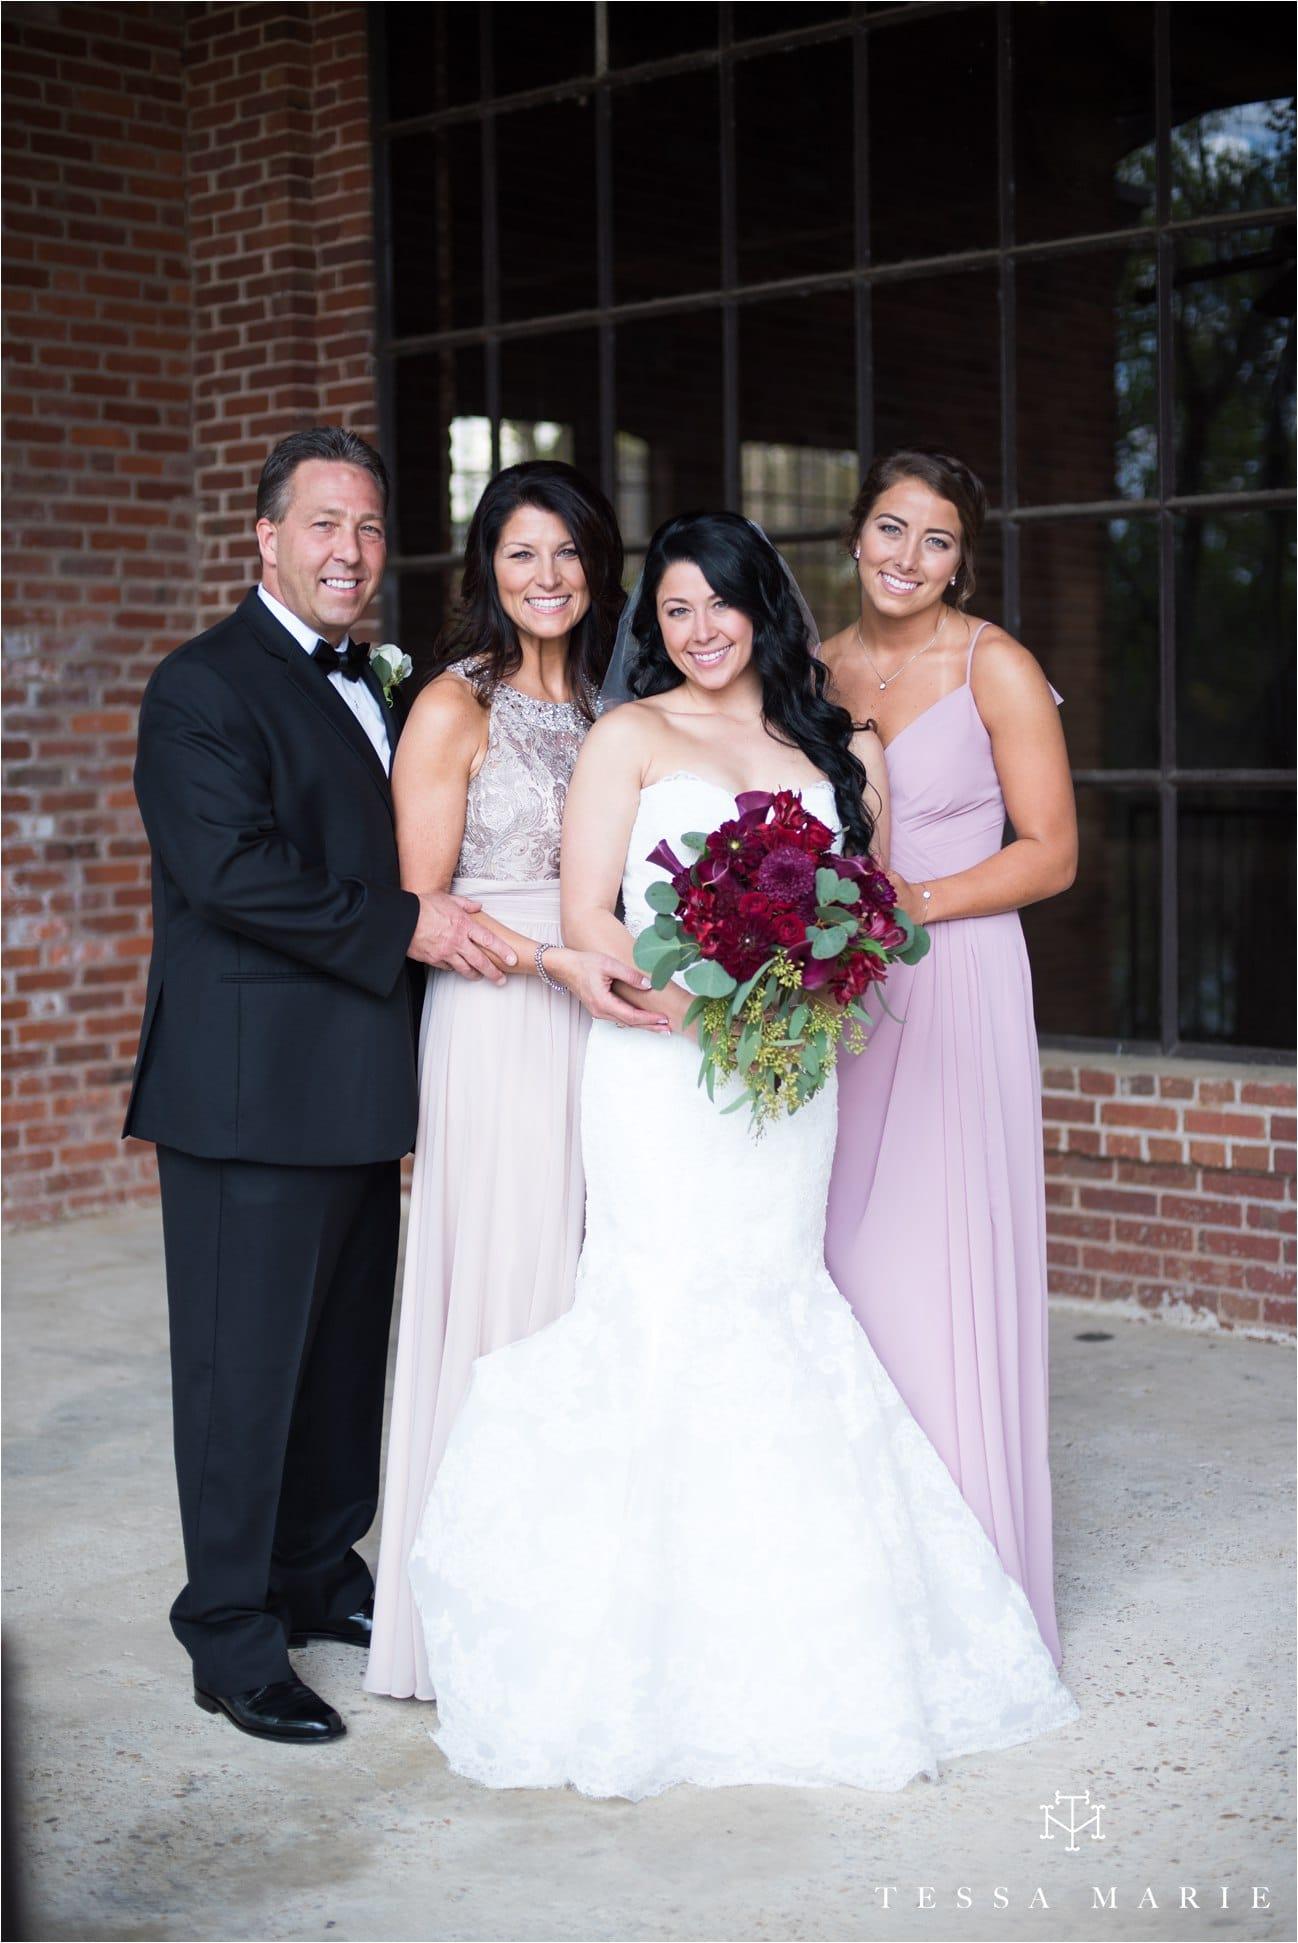 tessa_marie_weddings_rivermill_event_centere_candid_outdoor_wedding_photos_0054